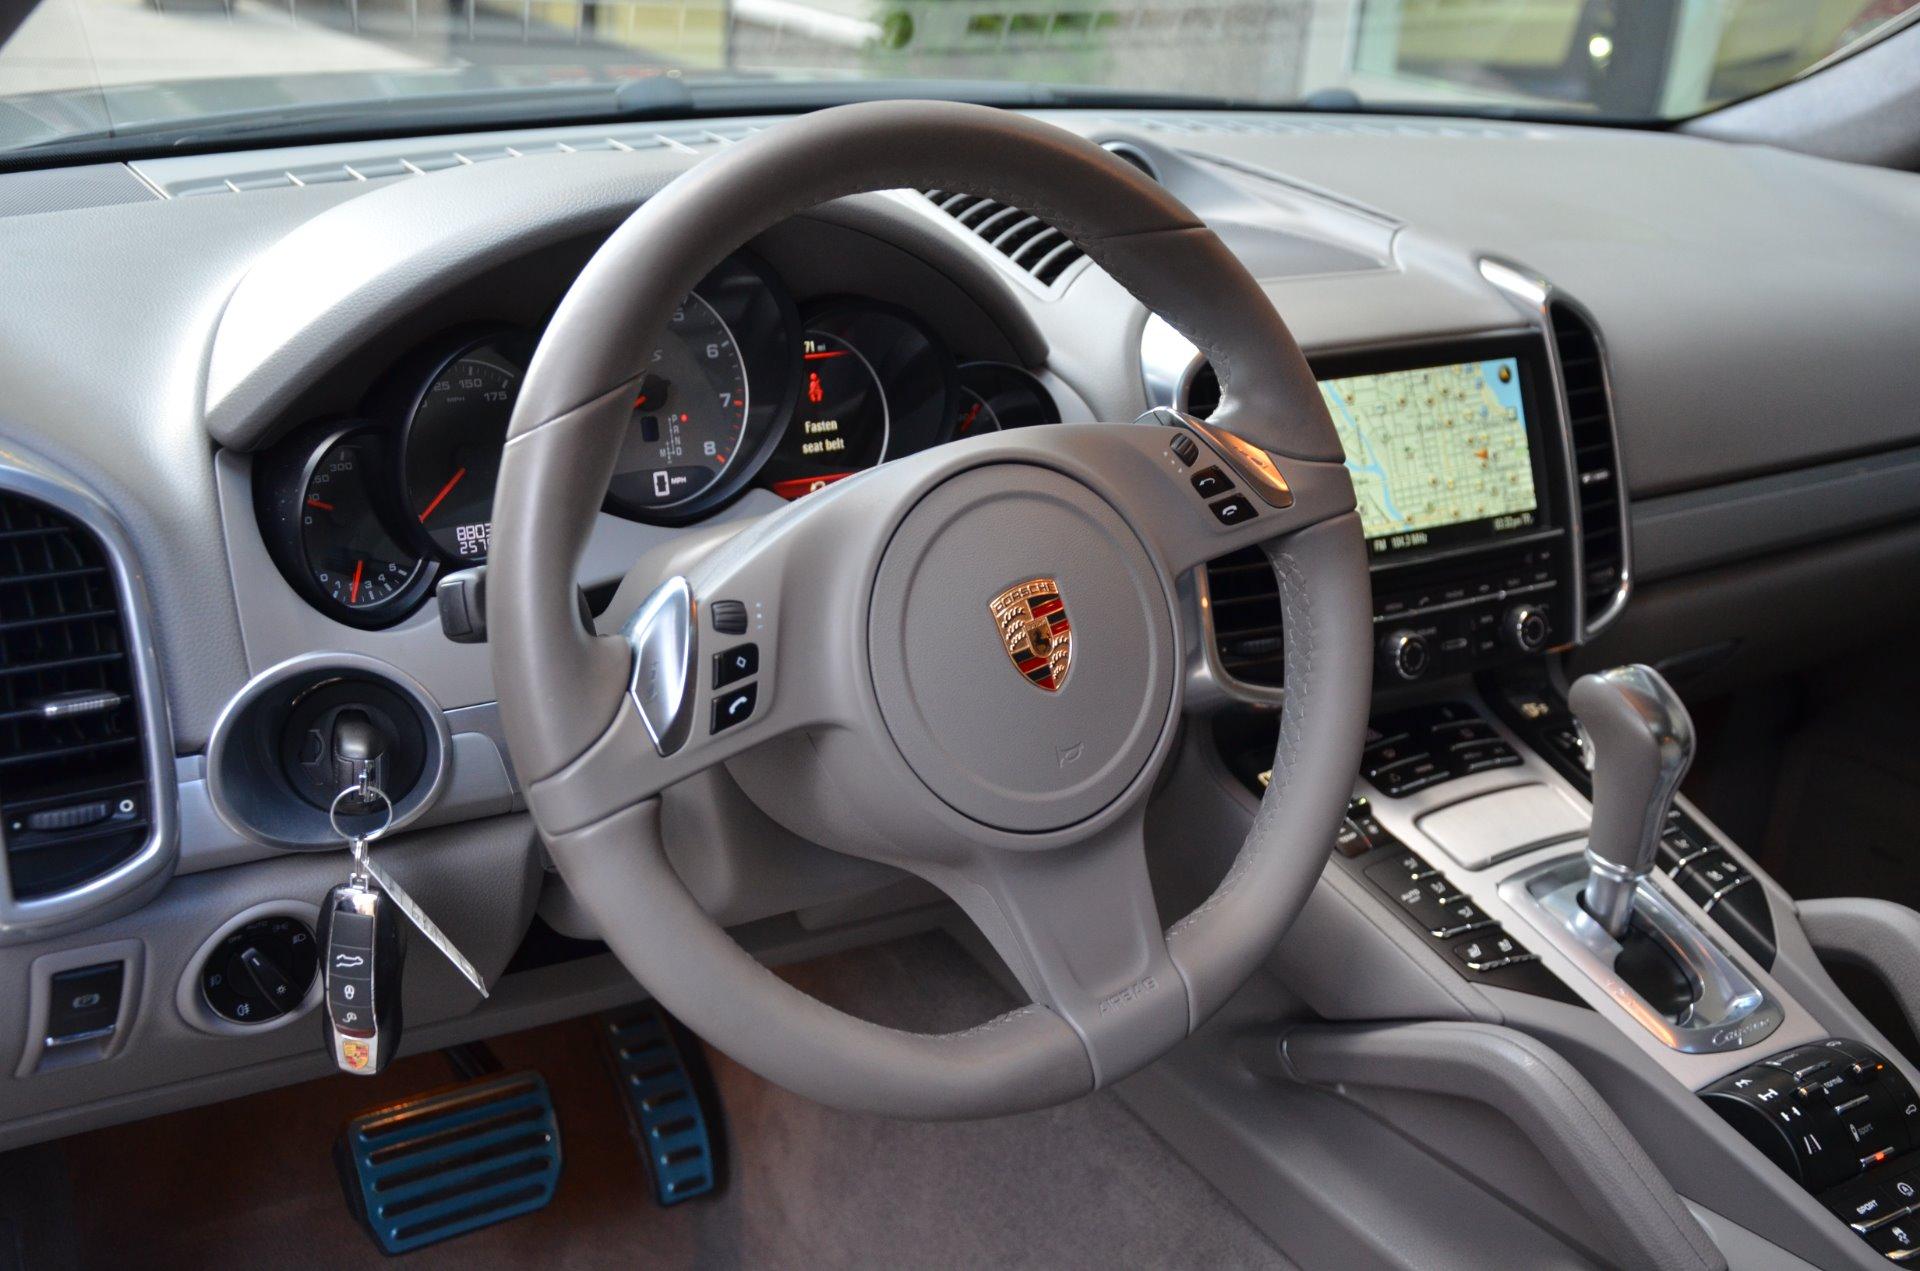 2013 Porsche Cayenne Gts Stock 70266 For Sale Near Chicago Il Il Porsche Dealer